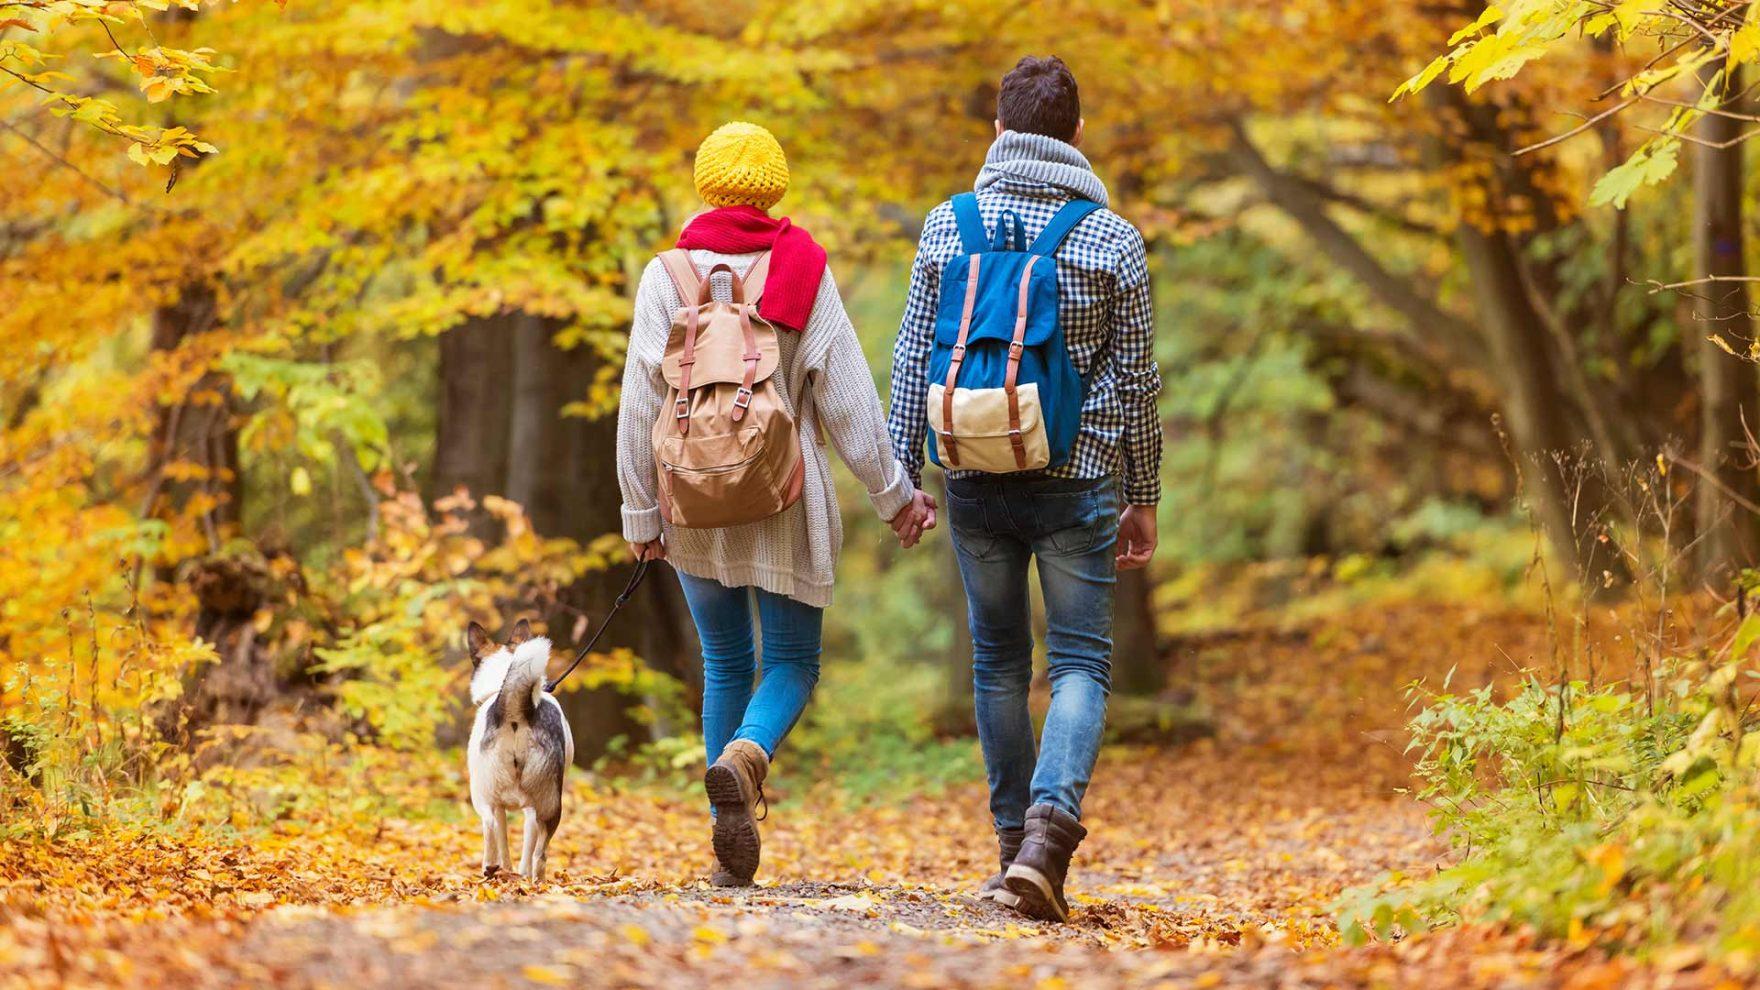 Vacanze d'autunno a Merano e dintorni - Vacanze con il cane